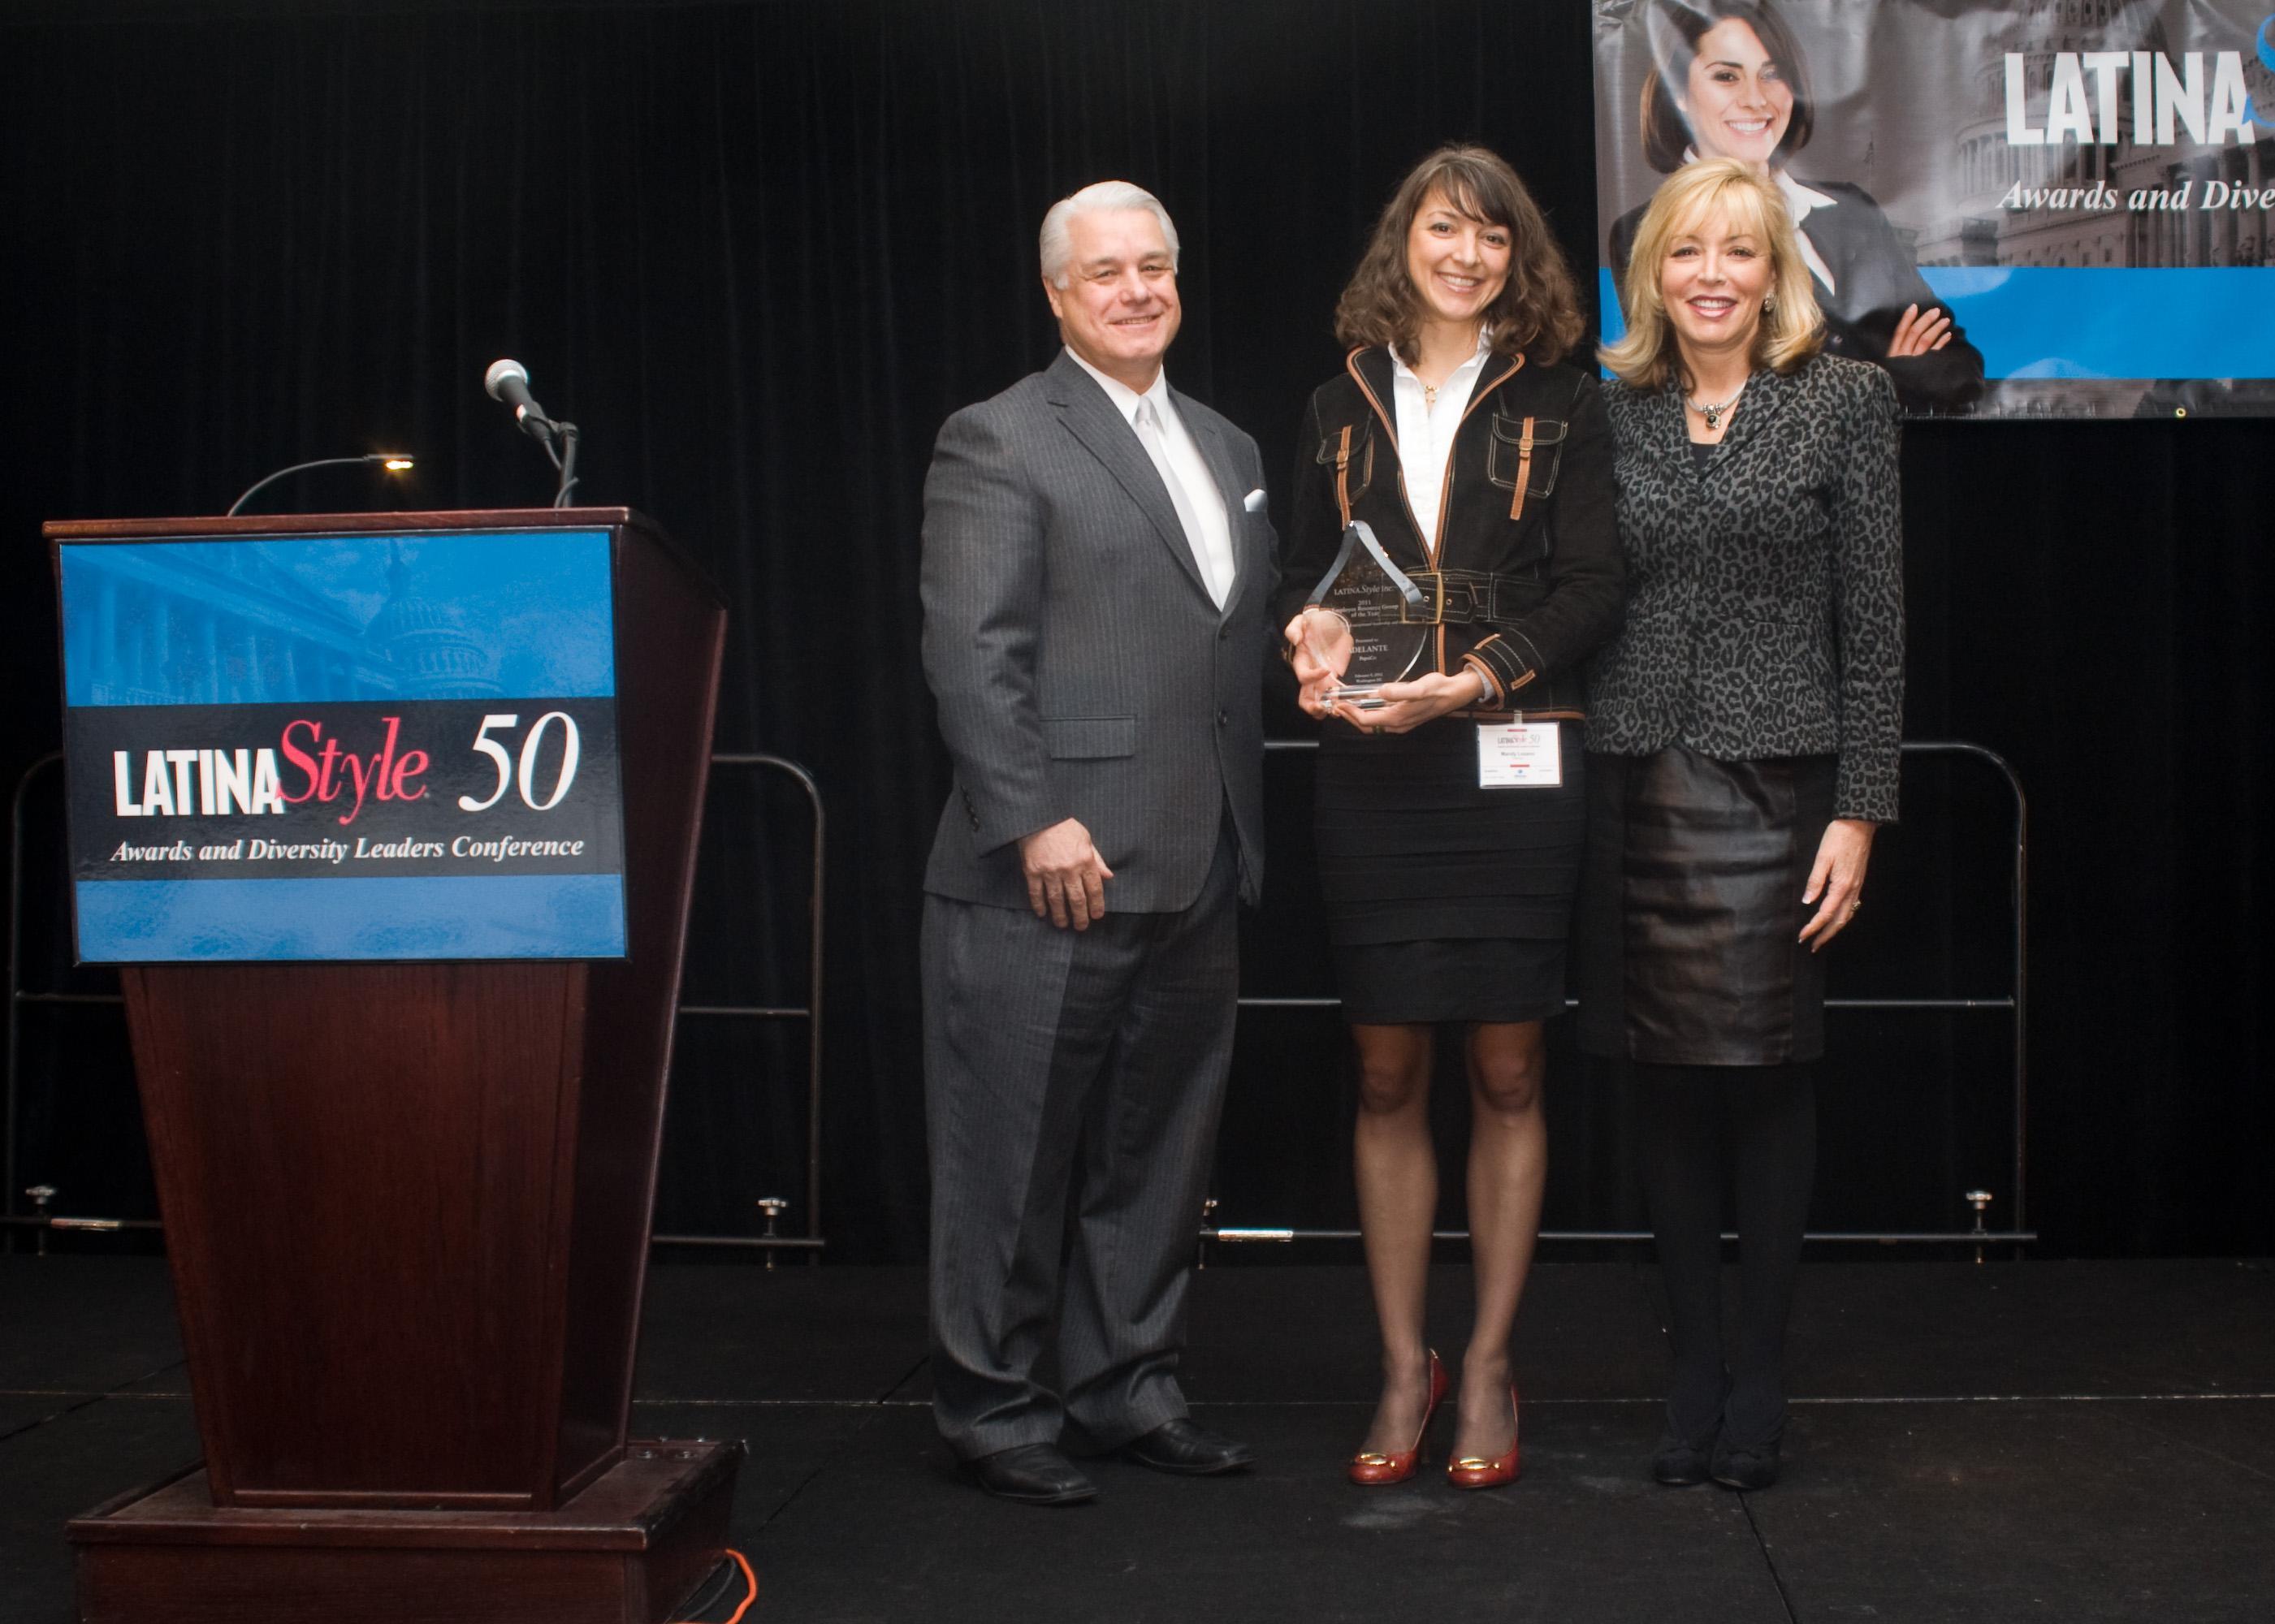 PepsiCo's Adelante named 2011 Employee Resource Group at Latina Style 50 Awards